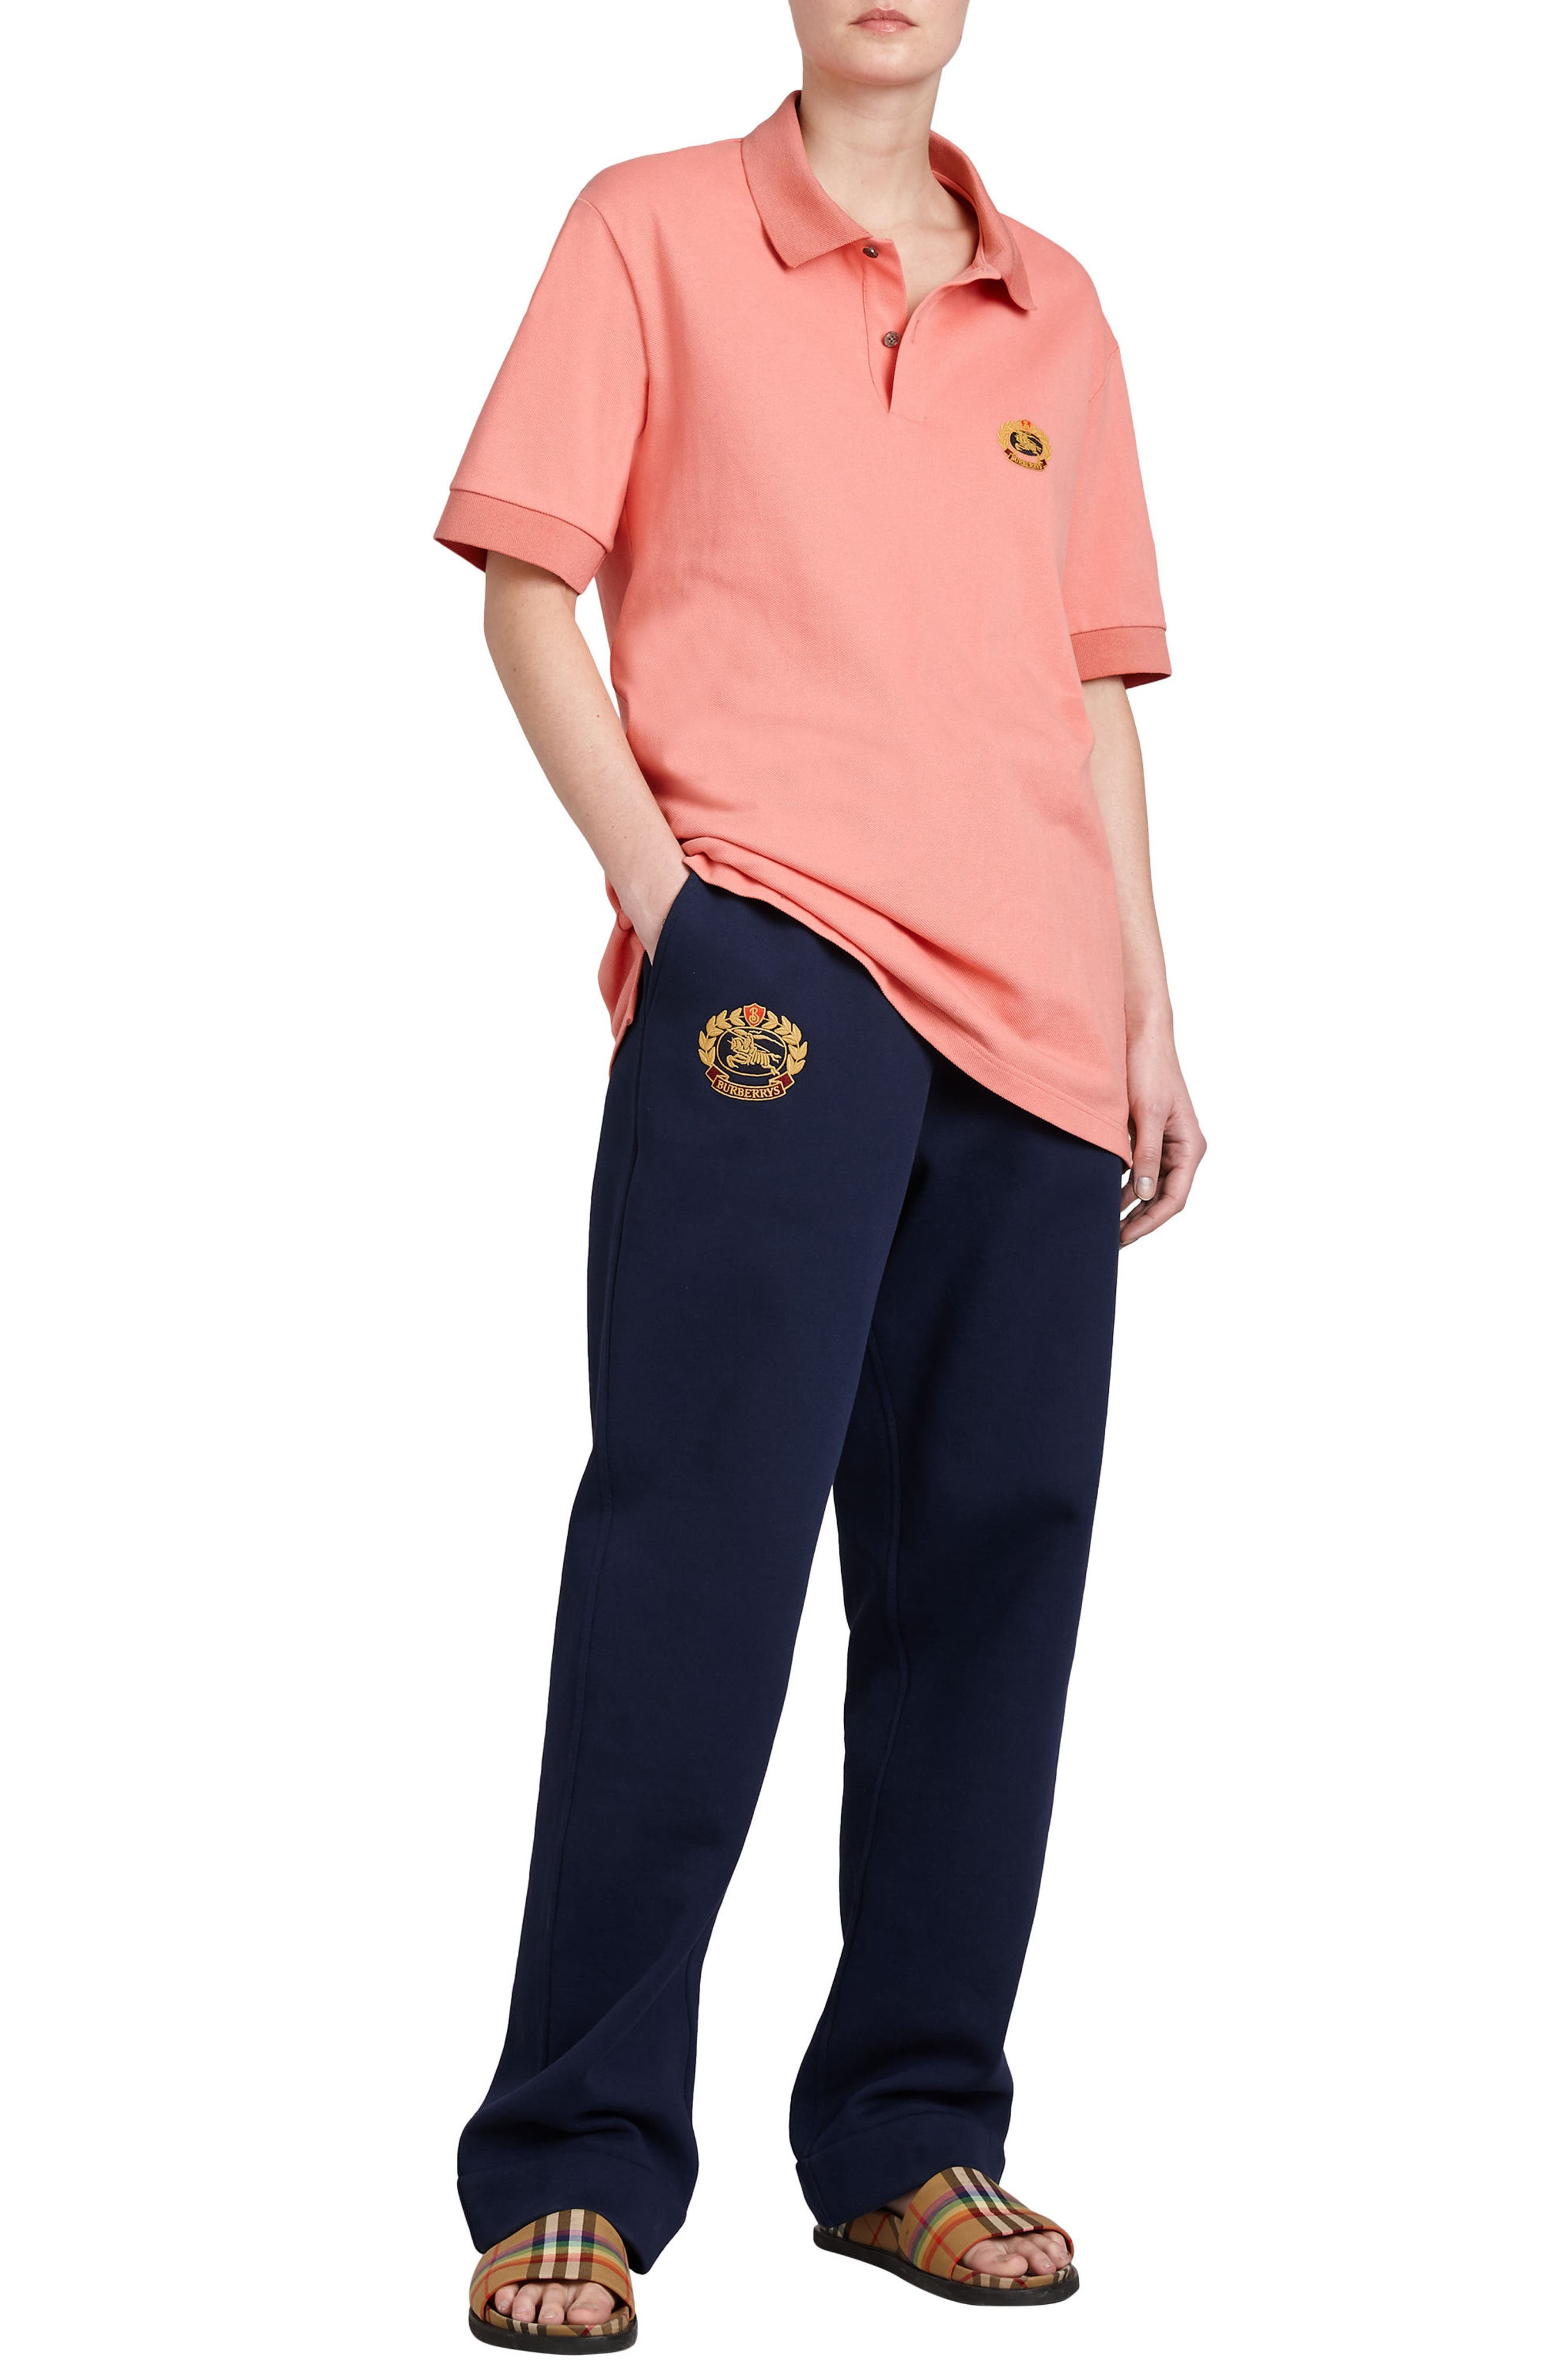 Vintage Crest Sweatpants,                             Alternate thumbnail 7, color,                             MIDNIGHT BLUE